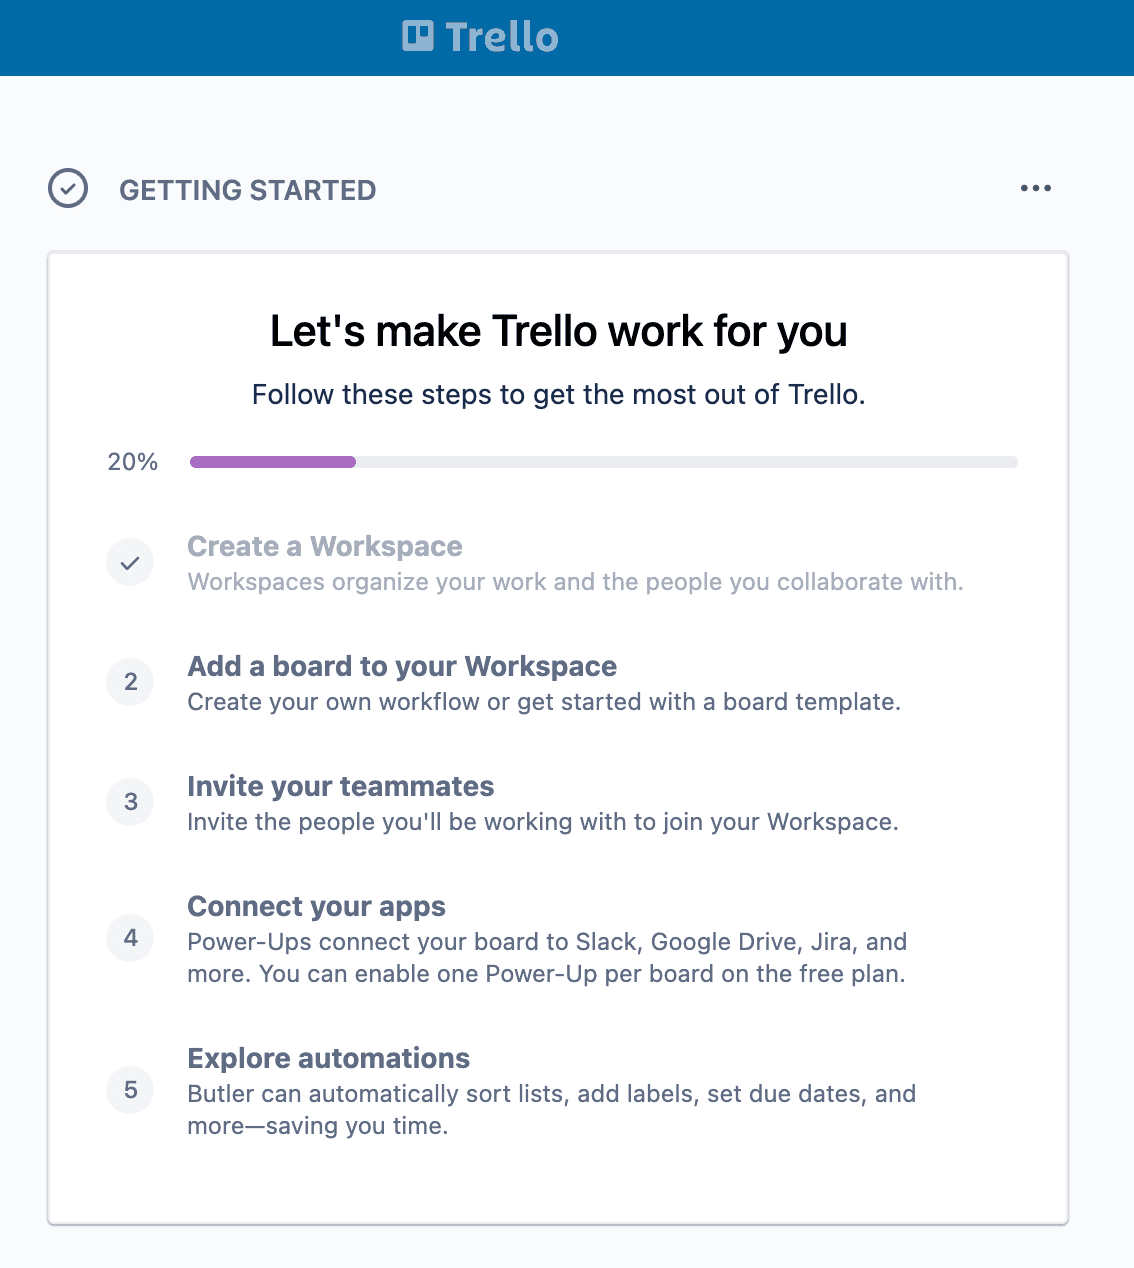 trello-checklist-onboarding